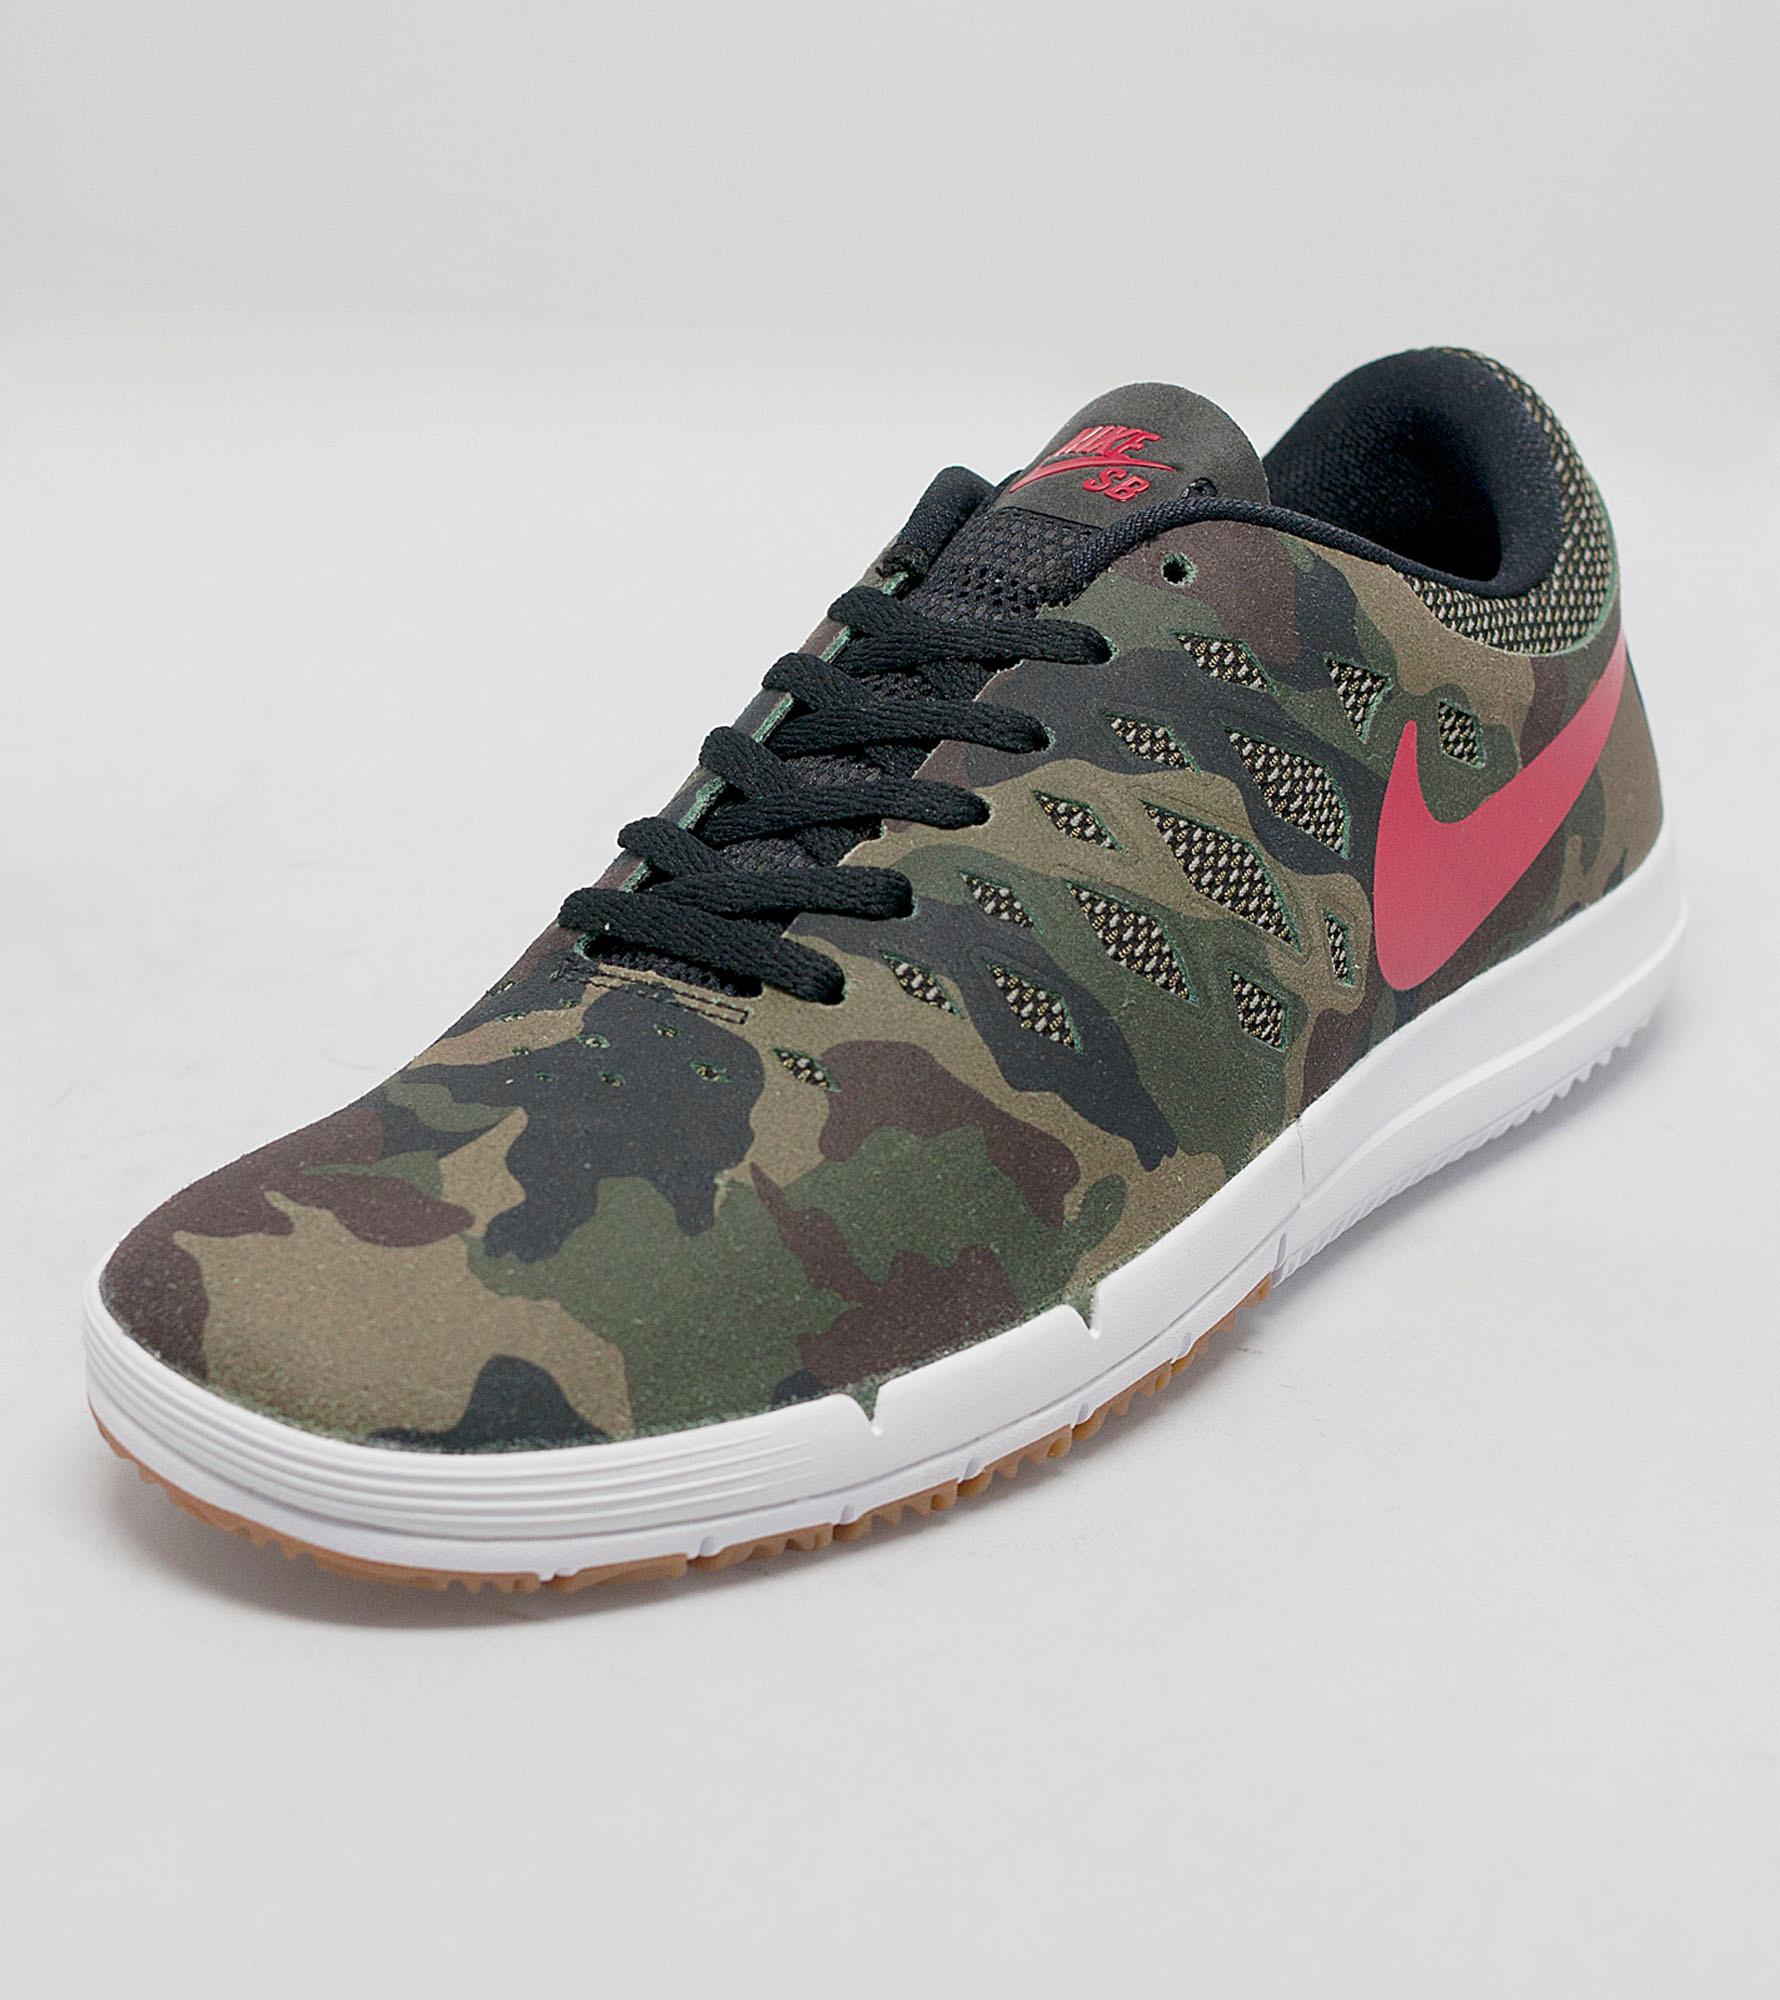 Taille Nike Rose Sb Libre